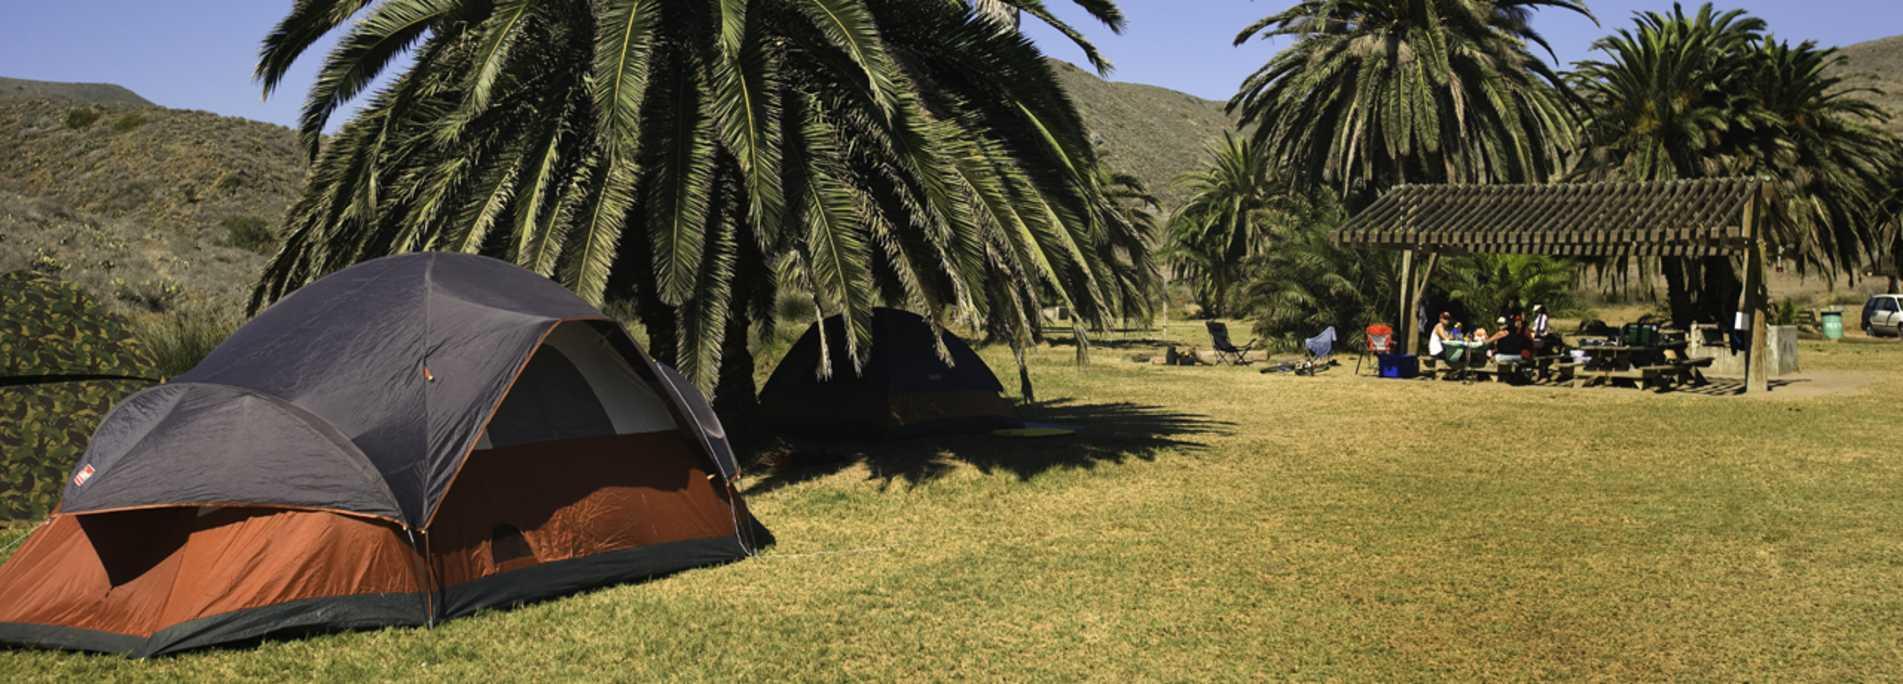 19845cae088 Camping on Catalina Island - Catalina Chamber & Tourism